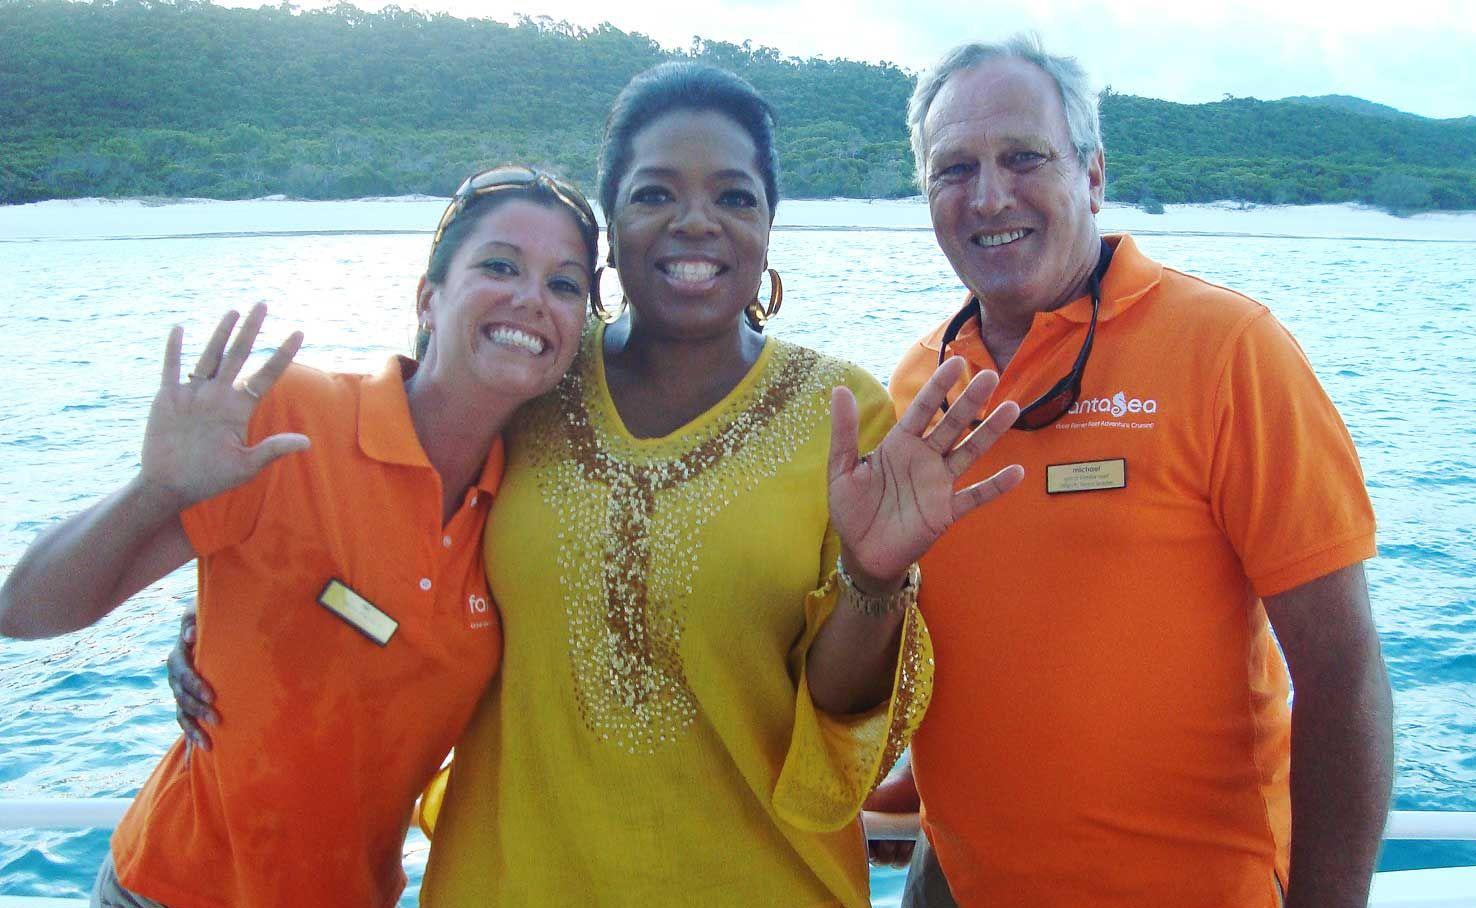 Fantasea cruise attendant Nicola Hind, Oprah Winfrey and senior cruise attendant Michael Moran last week on Fantasea Adventure Cruises trip to Whitehaven Beach.